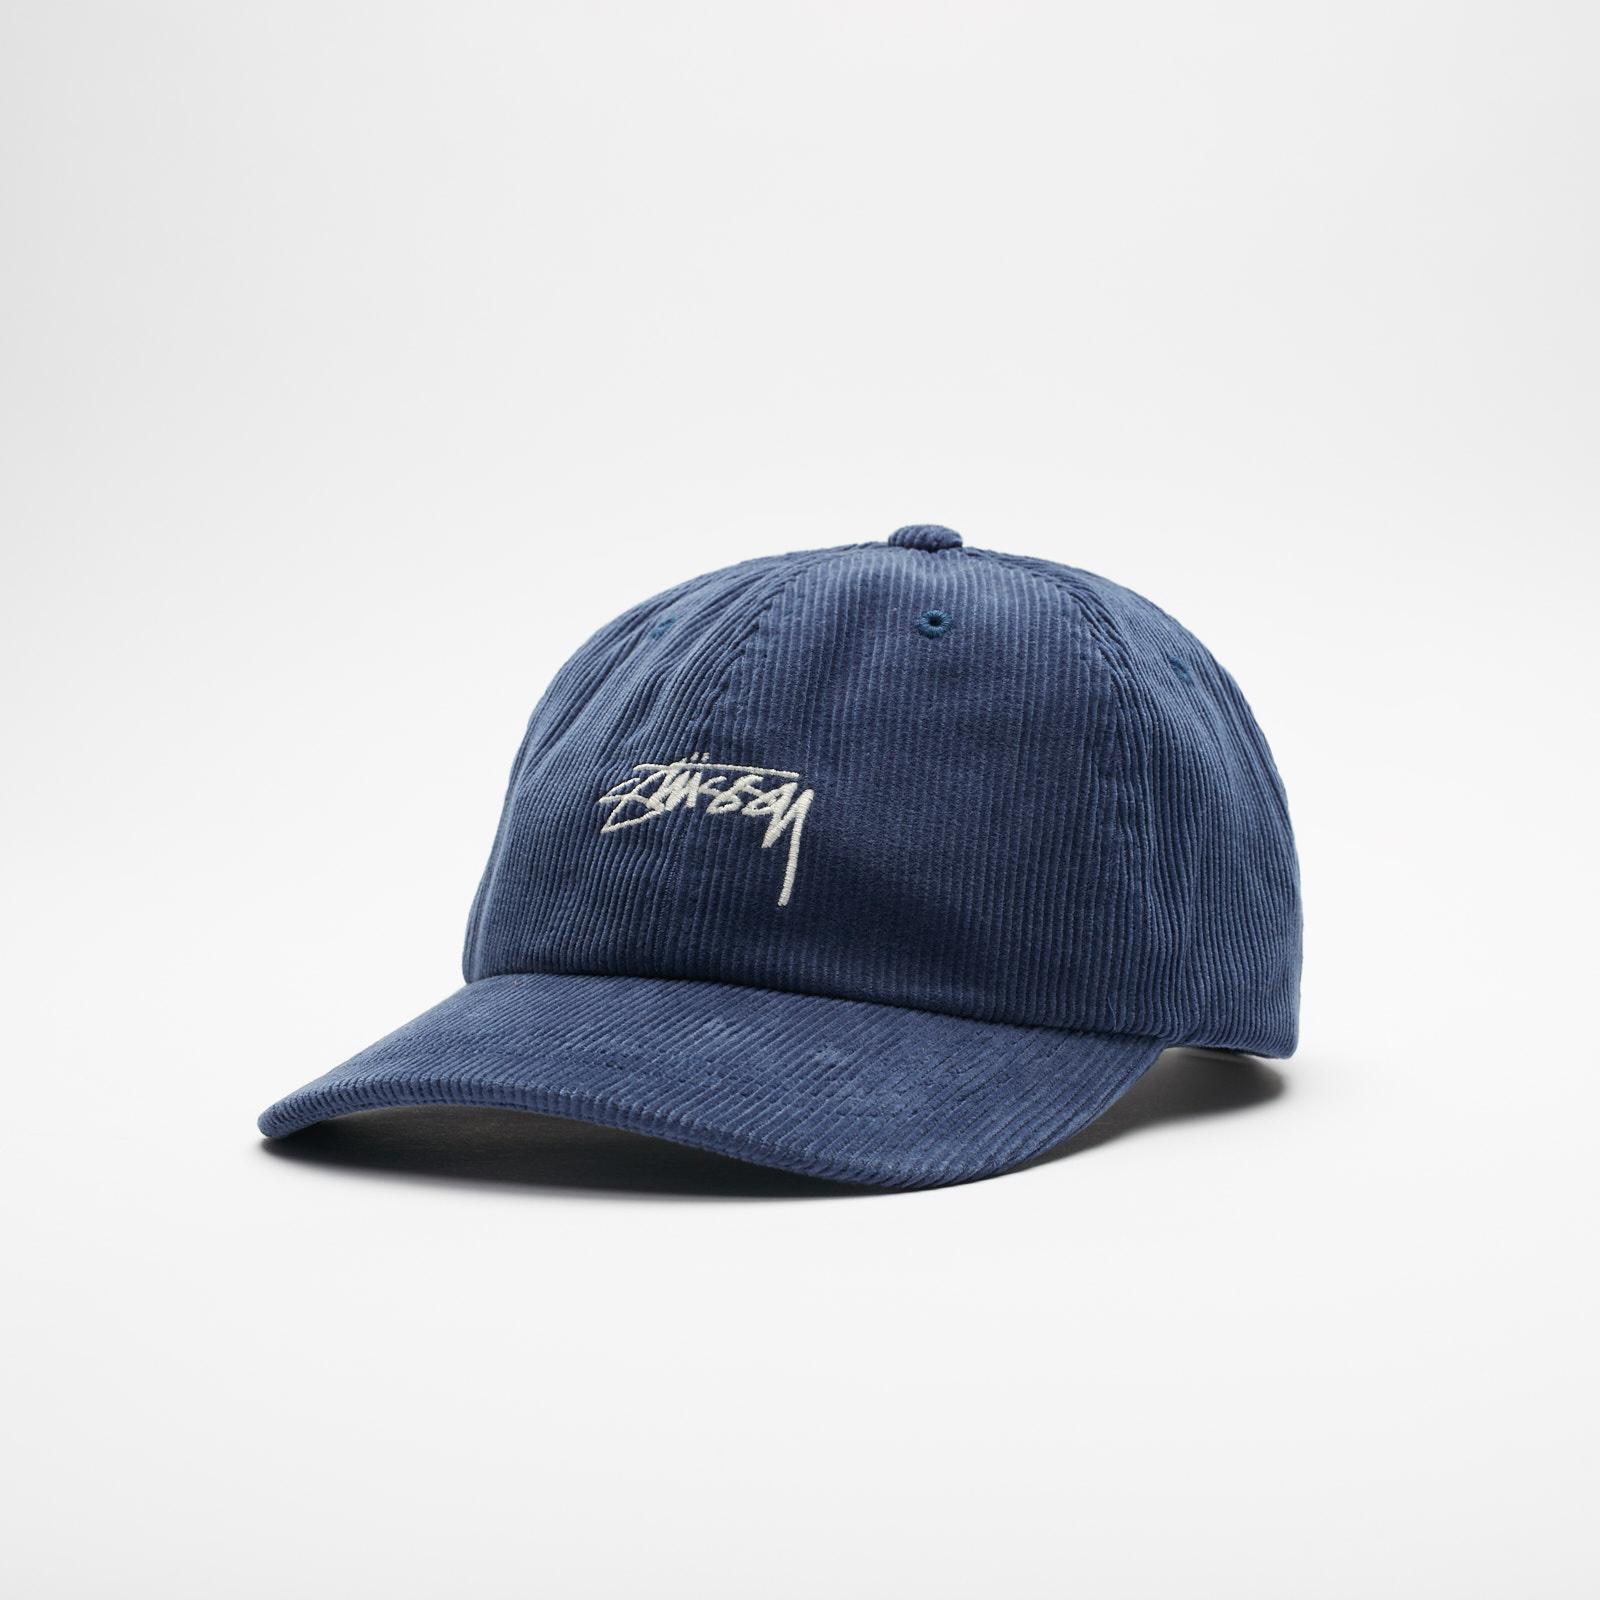 Stussy Corduroy Low Pro Cap - 131830-0801 - Sneakersnstuff ... 367f78ad149